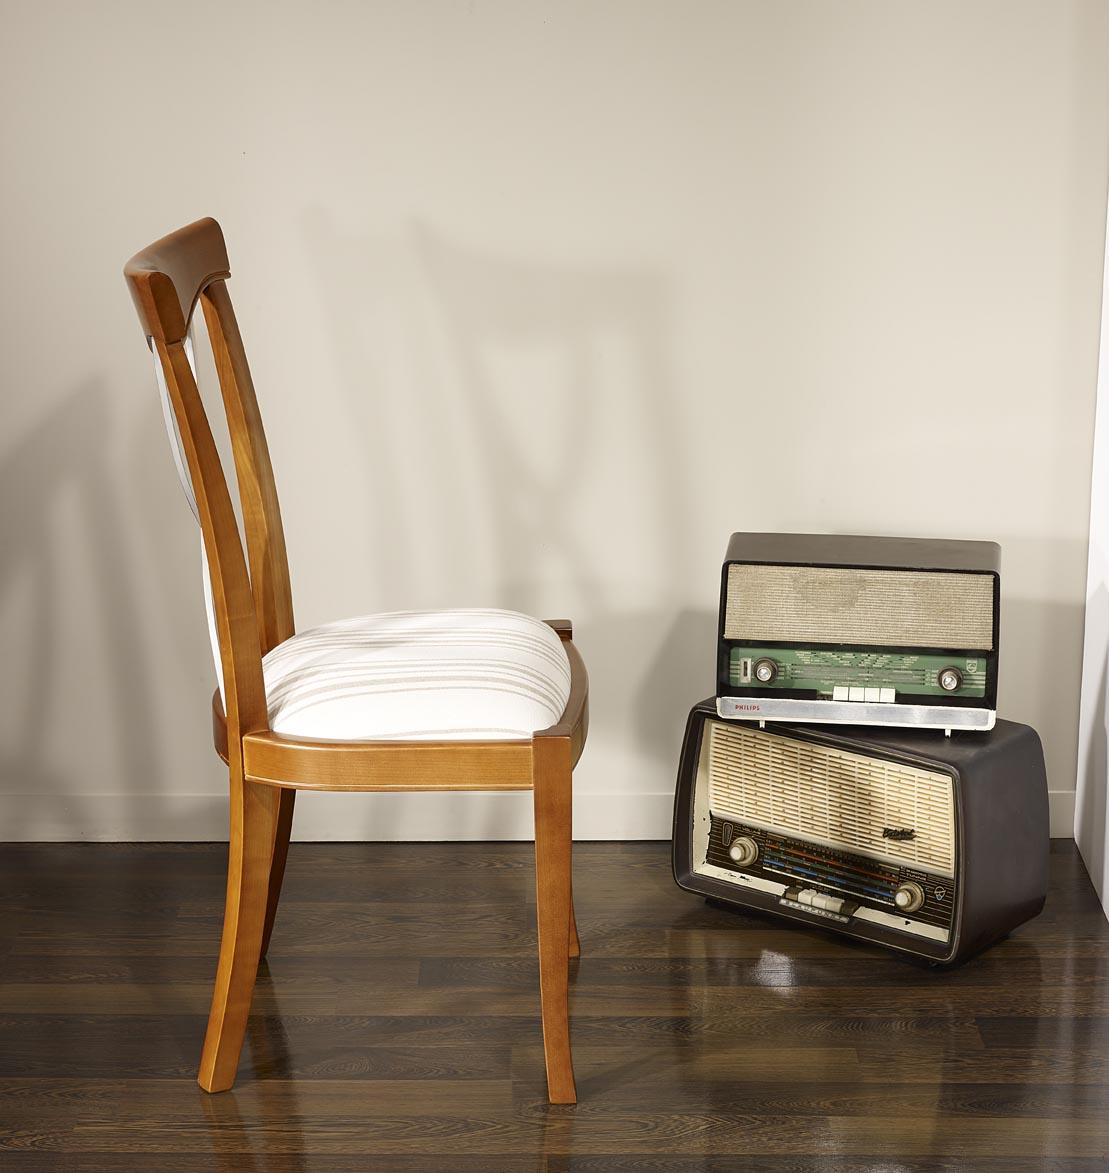 chaise lilas en merisier massif de style louis philippe meuble en merisier massif. Black Bedroom Furniture Sets. Home Design Ideas